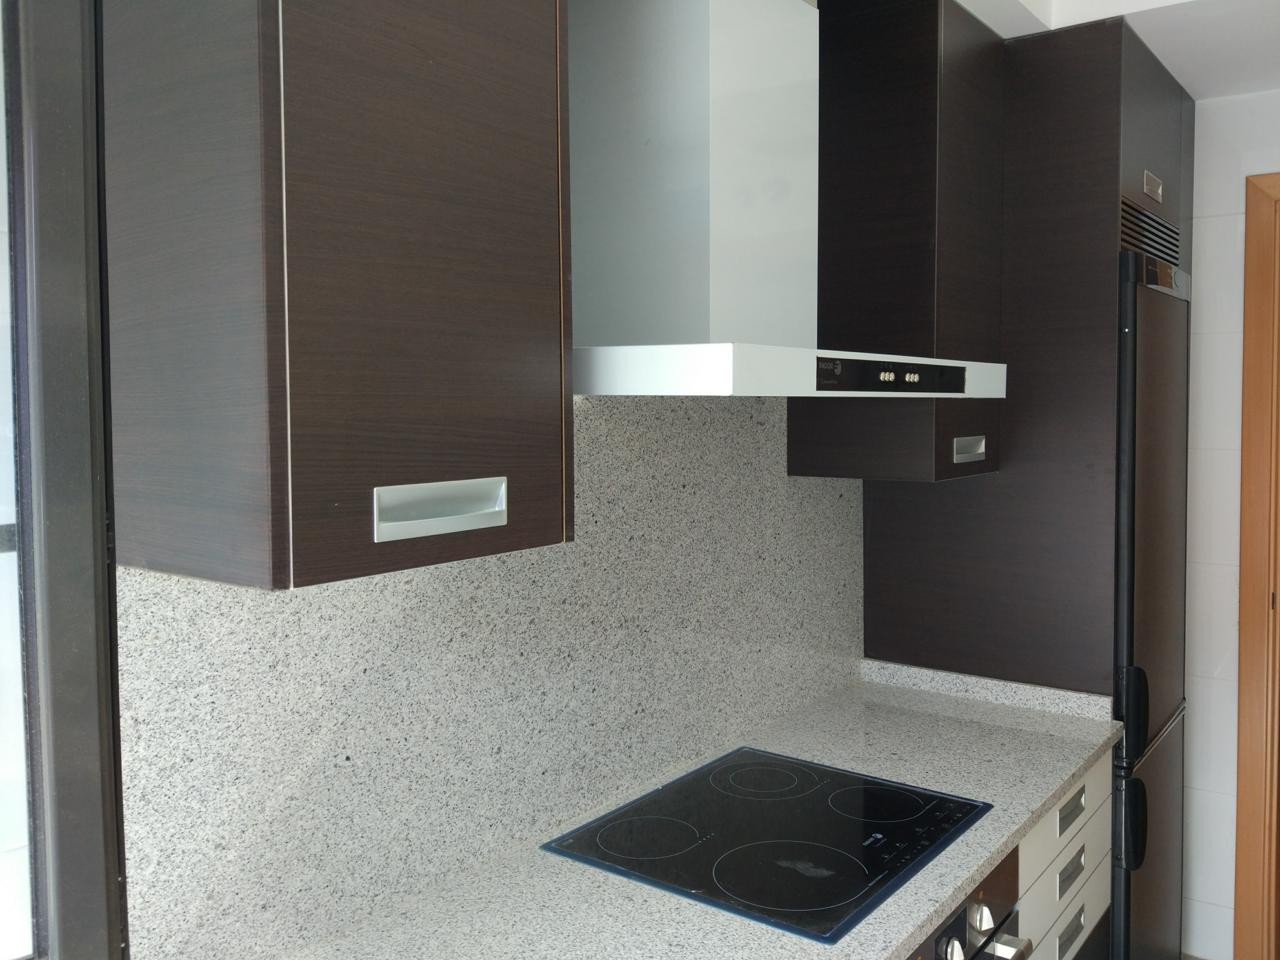 piso inversores con inquilino obra nueva zaragoza|publipisos inmobiliarias-4